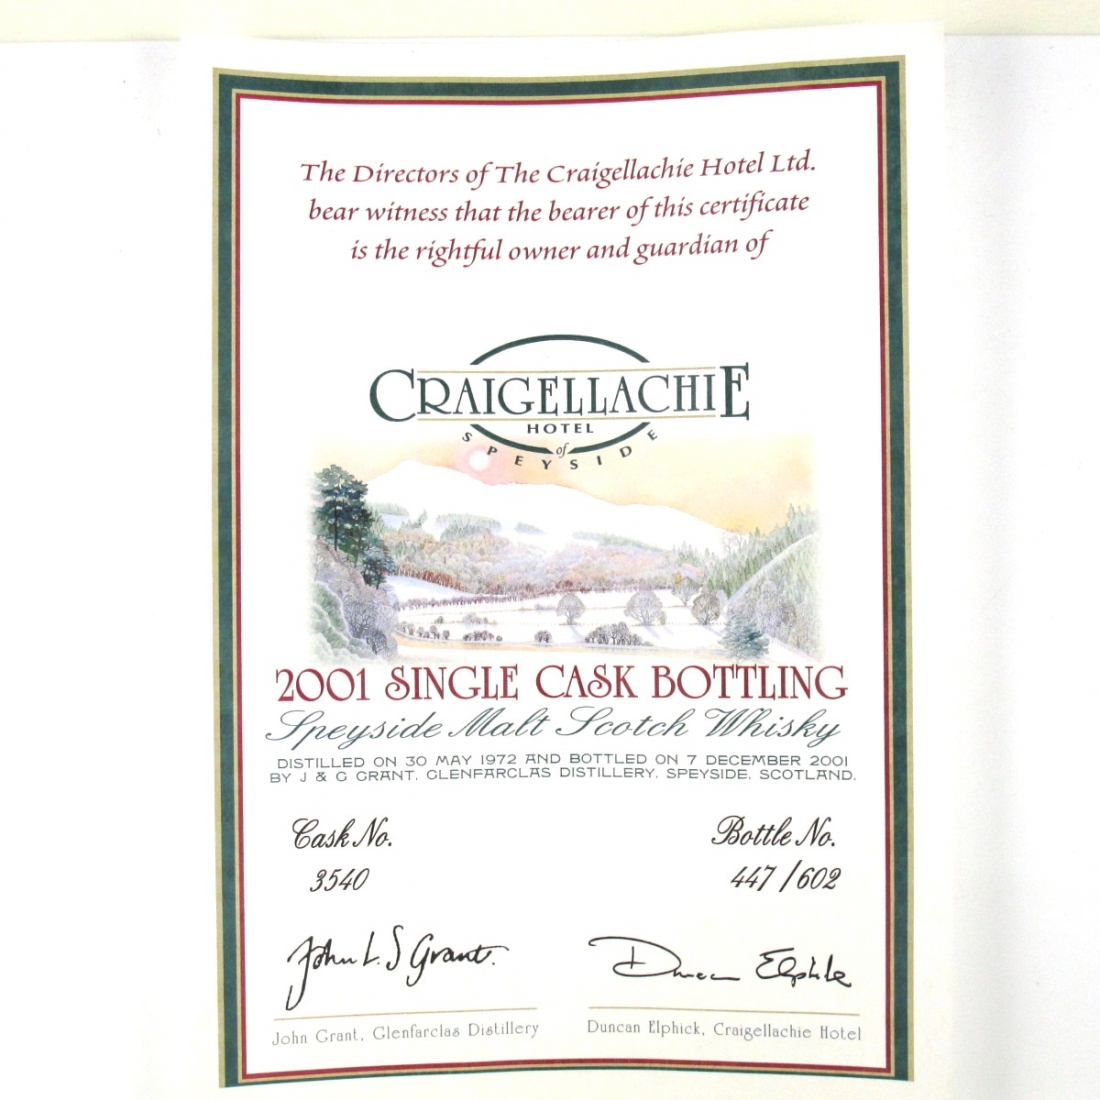 Glenfarclas 1972 Single Cask 29 Year Old / Craigellachie Hotel Exclusive